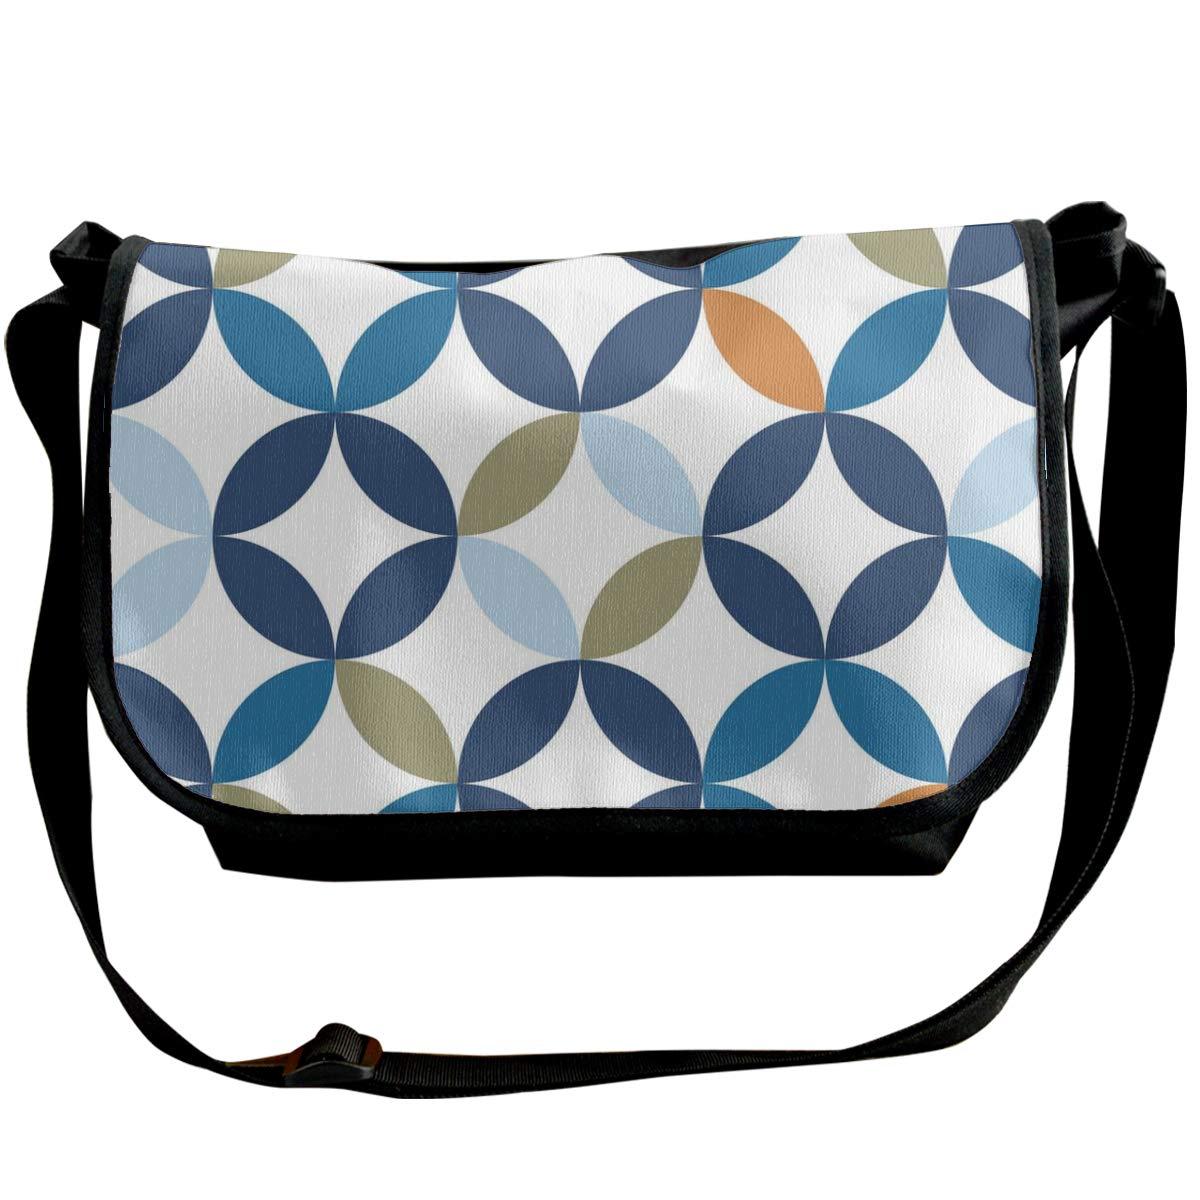 Taslilye Vintage Seamless Pattern Vector Image Customized Wide Crossbody Shoulder Bag For Men And Women For Daily Work Or Travel